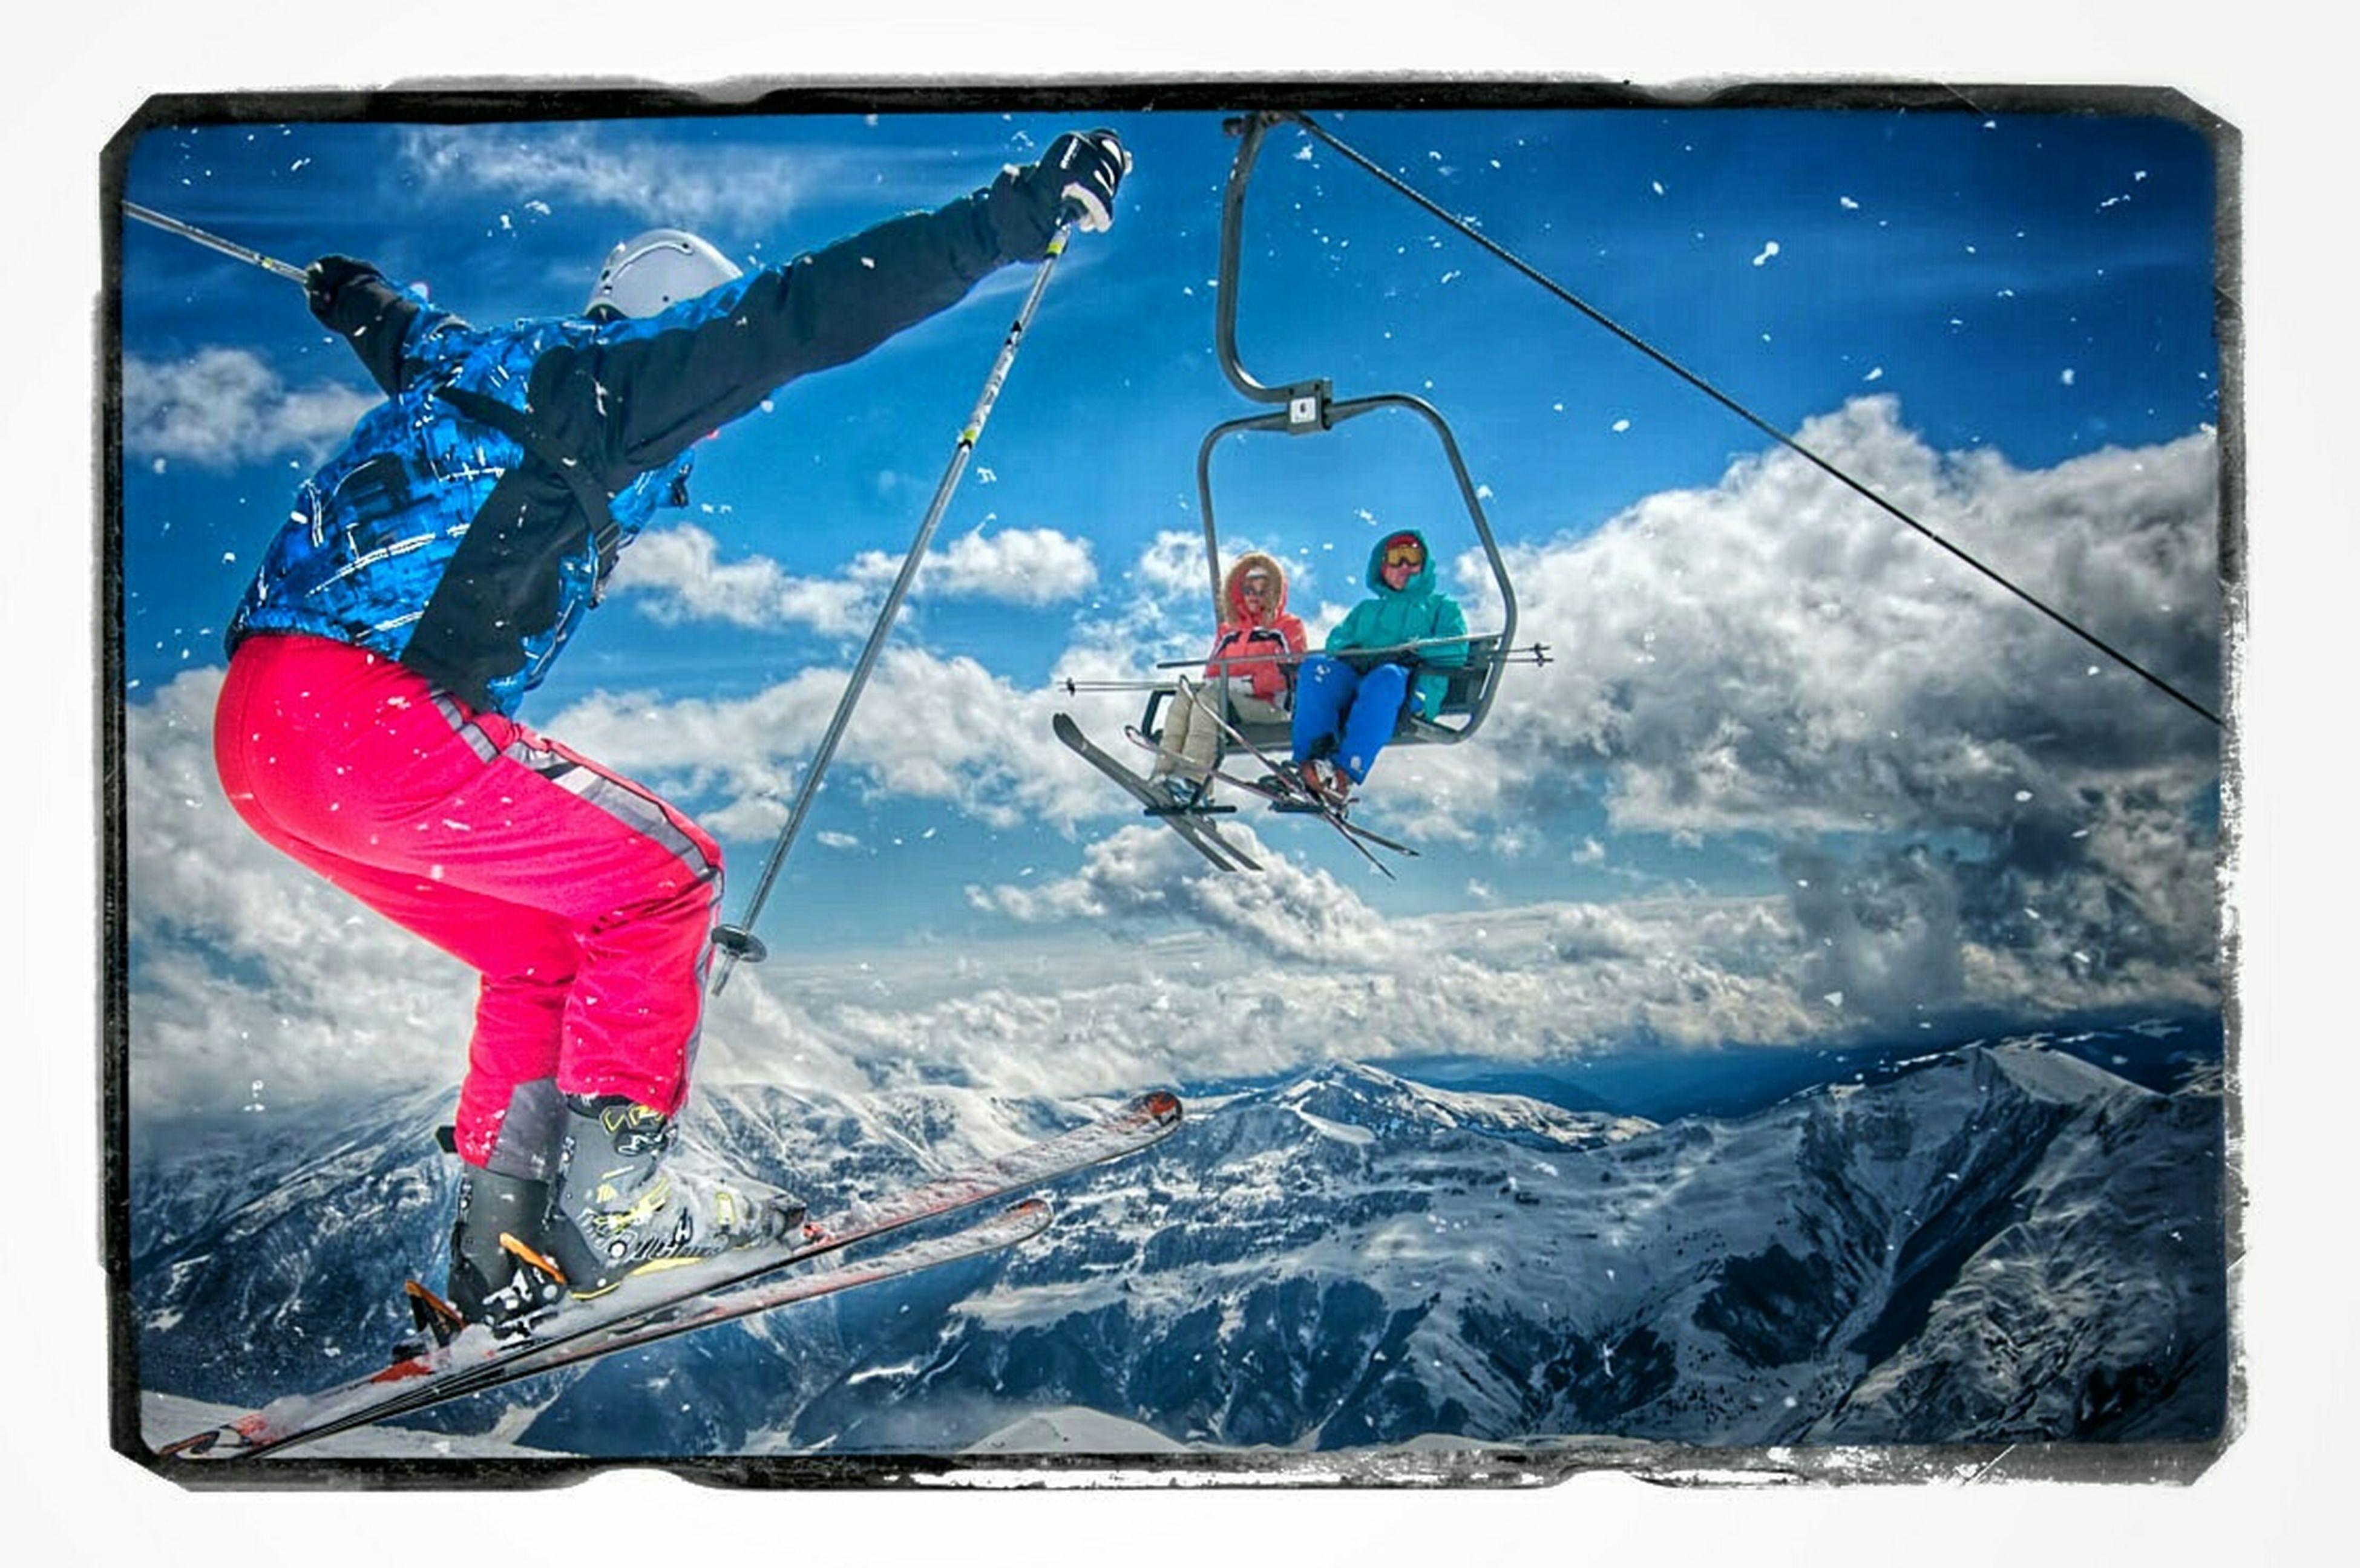 snow, winter, cold temperature, season, leisure activity, transportation, adventure, mode of transport, weather, lifestyles, extreme sports, sport, mountain, men, vacations, snowcapped mountain, enjoyment, travel